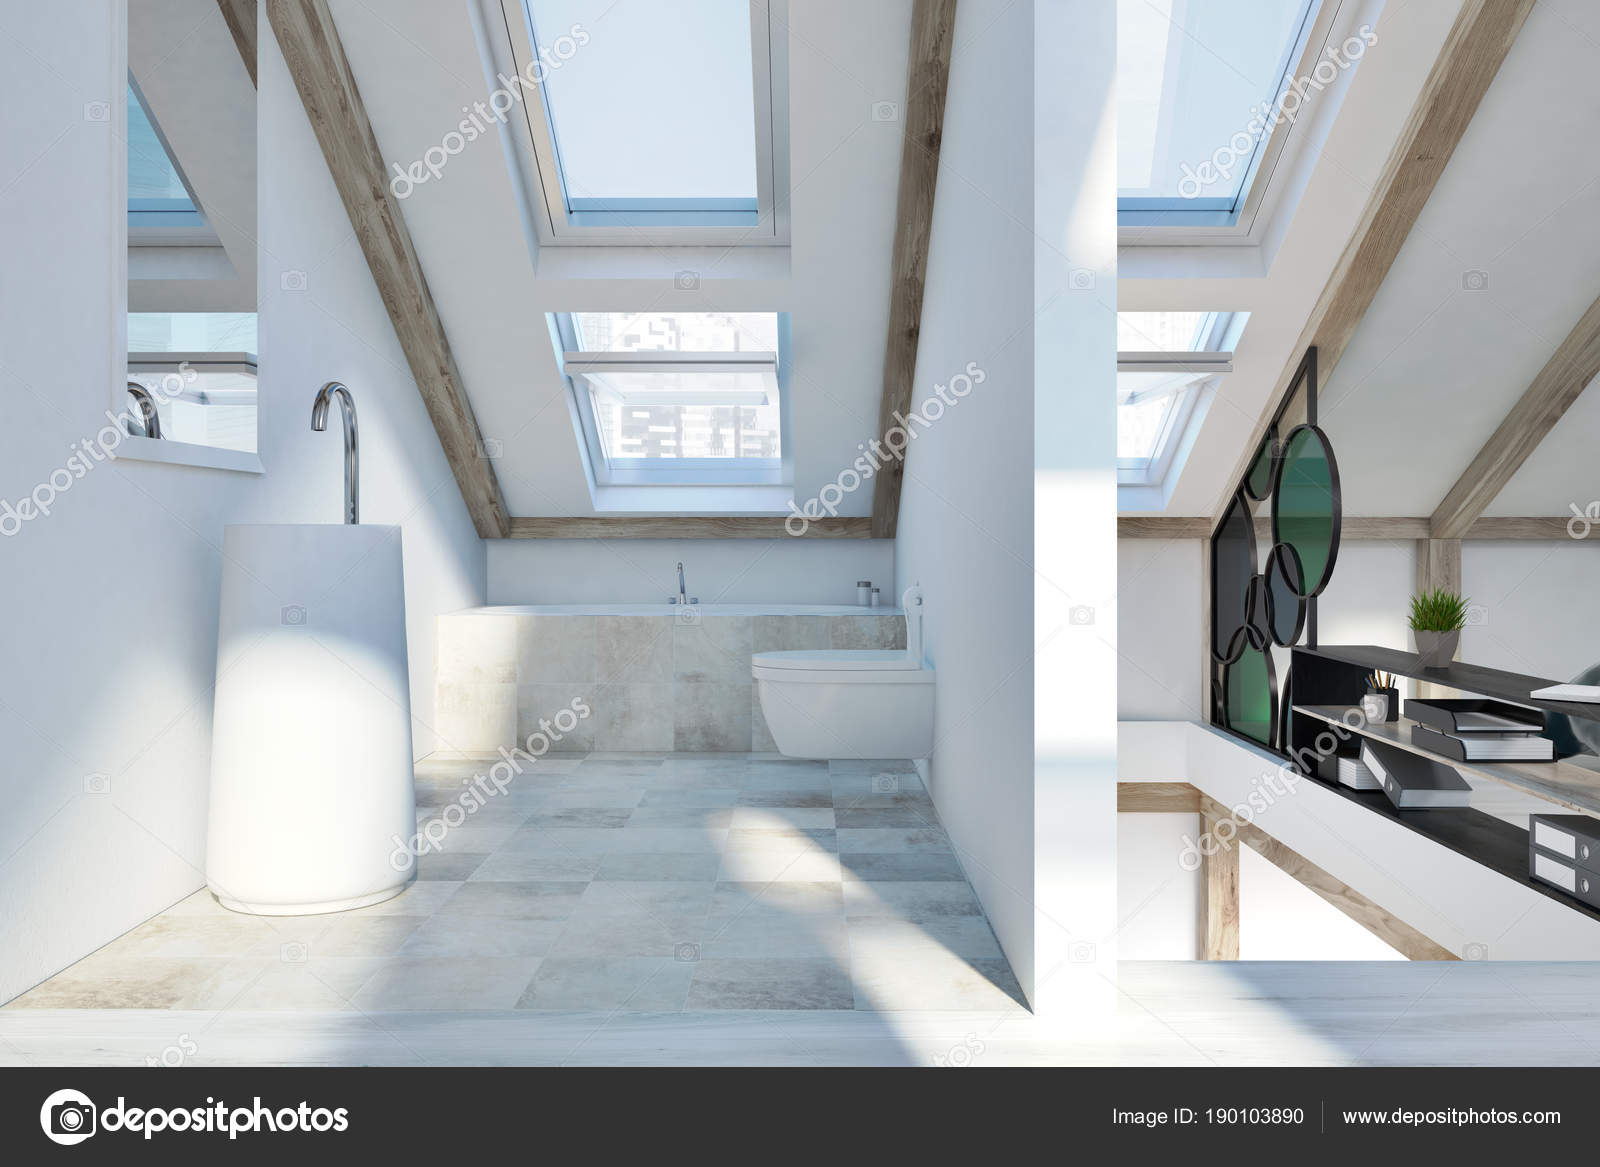 Dachgeschoss Schlafzimmer und Badezimmer Interieur — Stockfoto ...